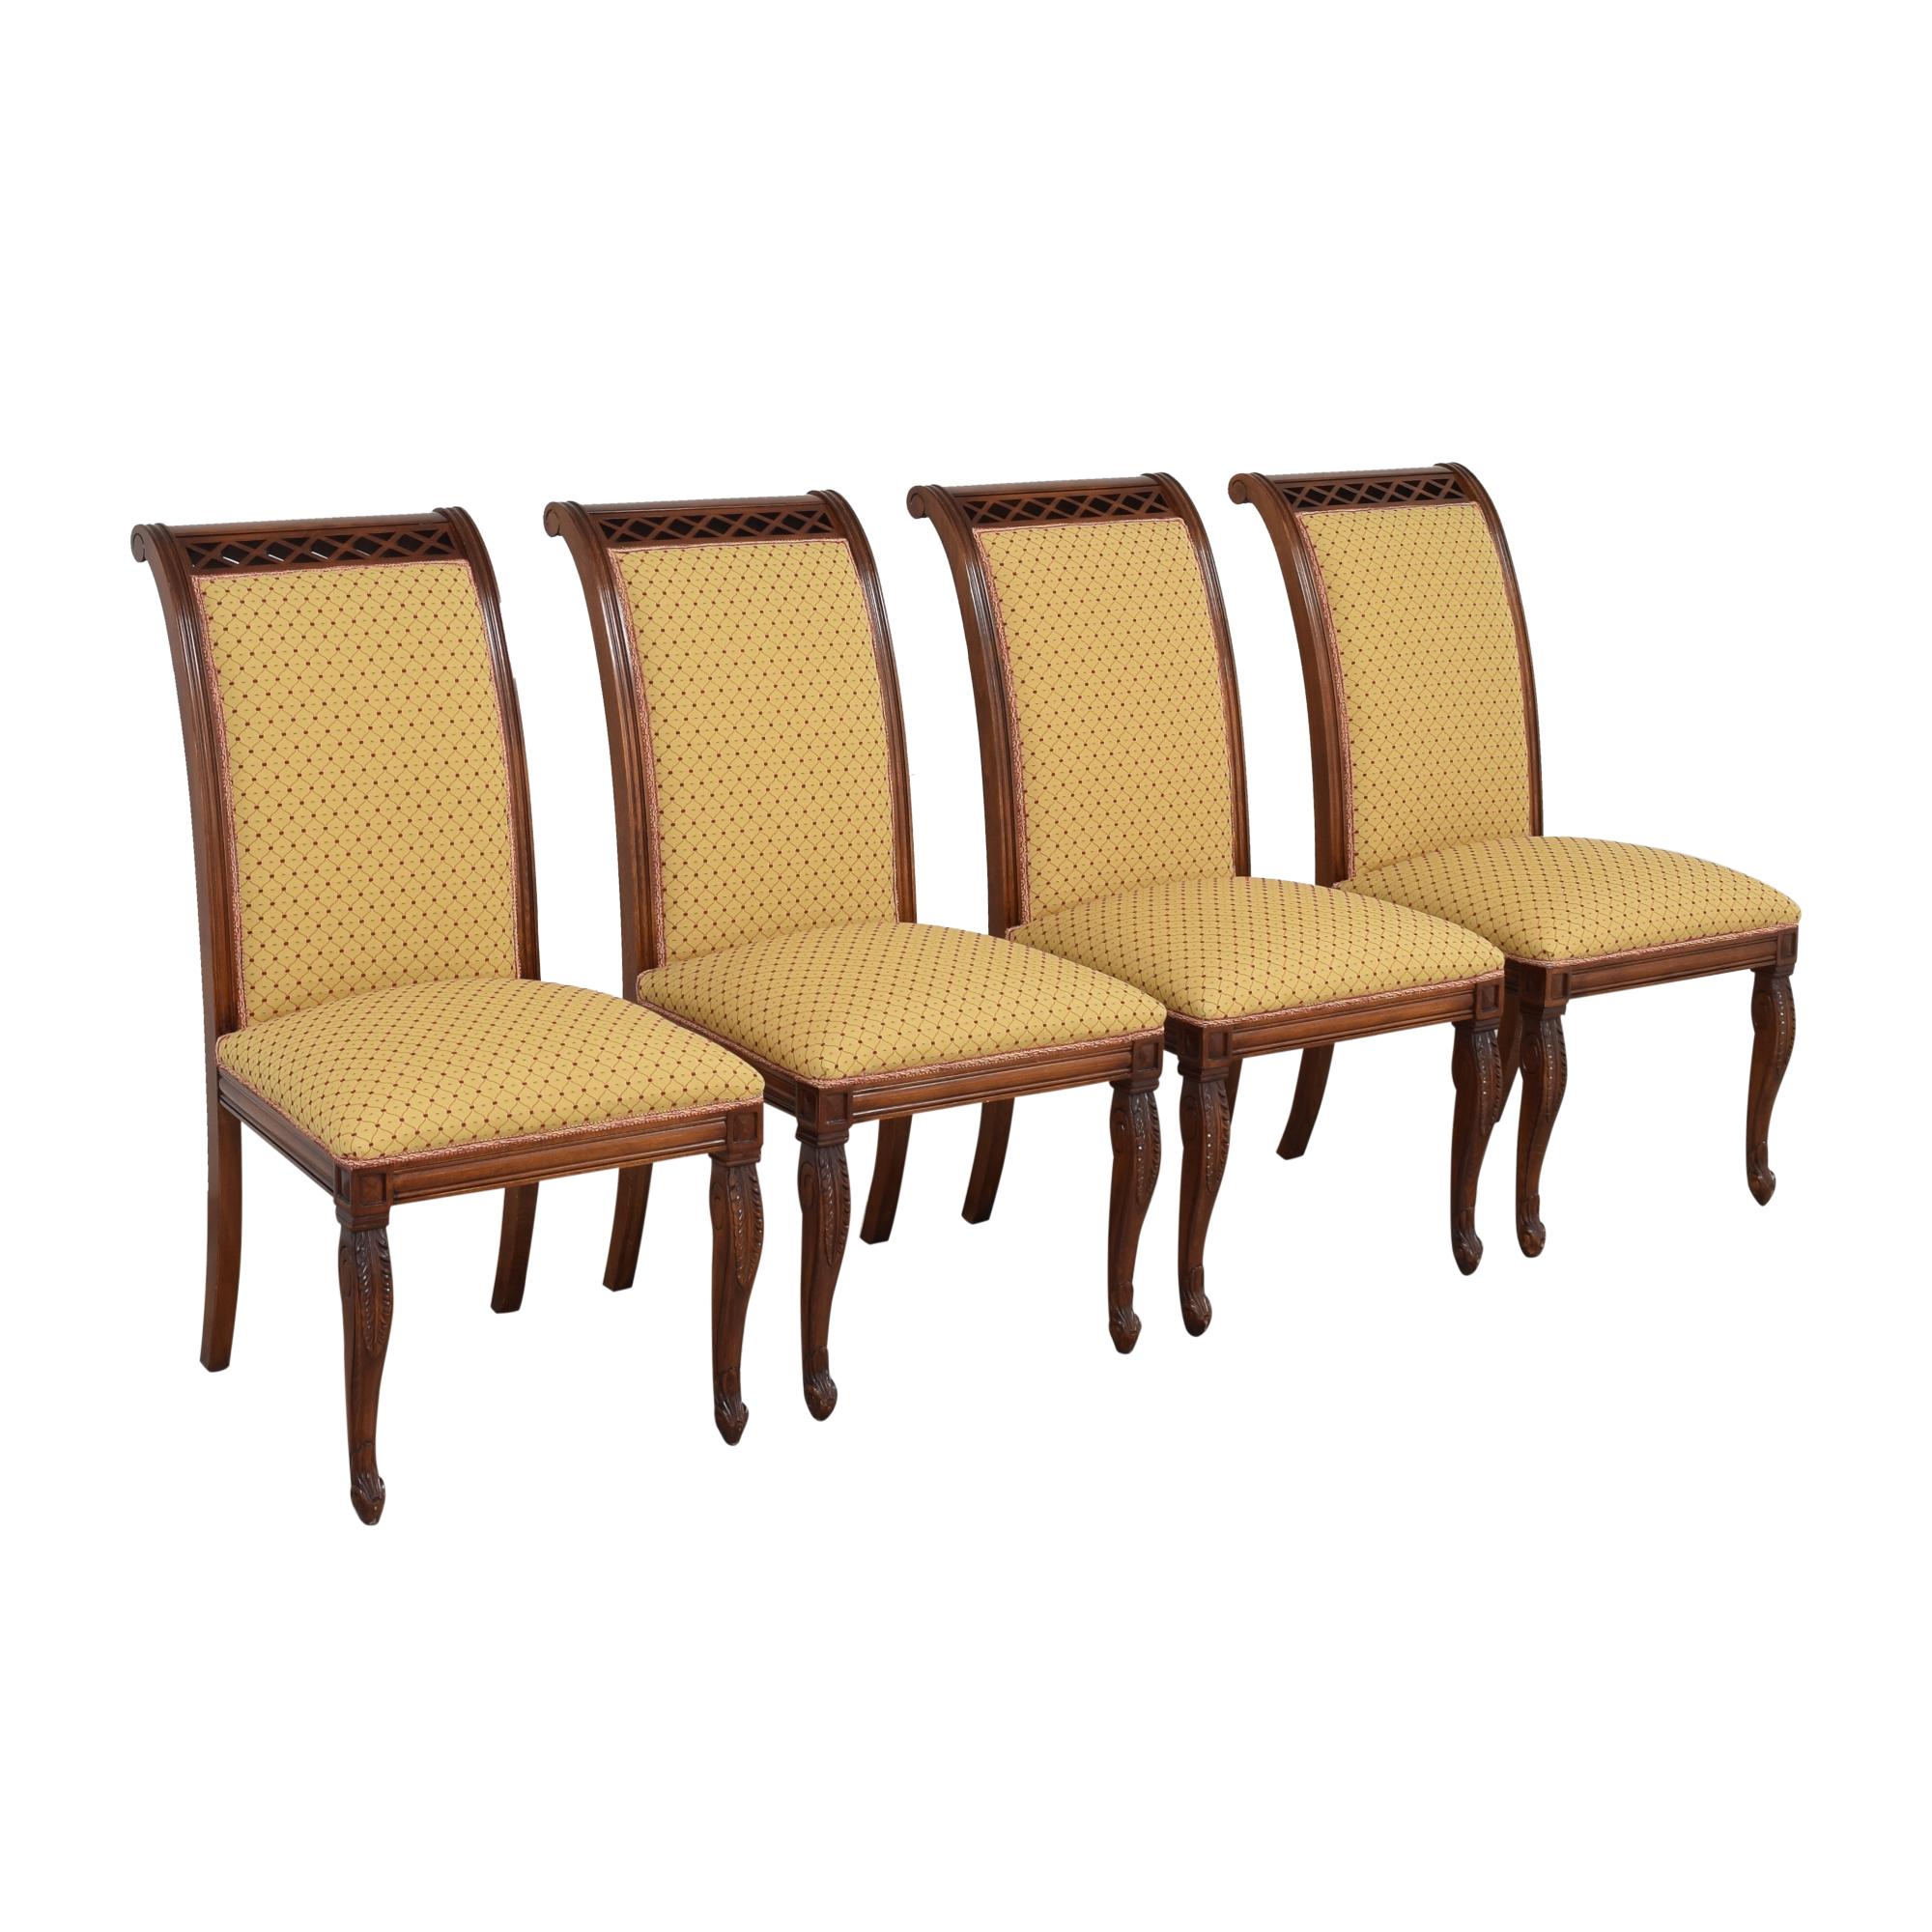 KPS Furnishings KPS Furnishings Custom Dining Chairs Chairs